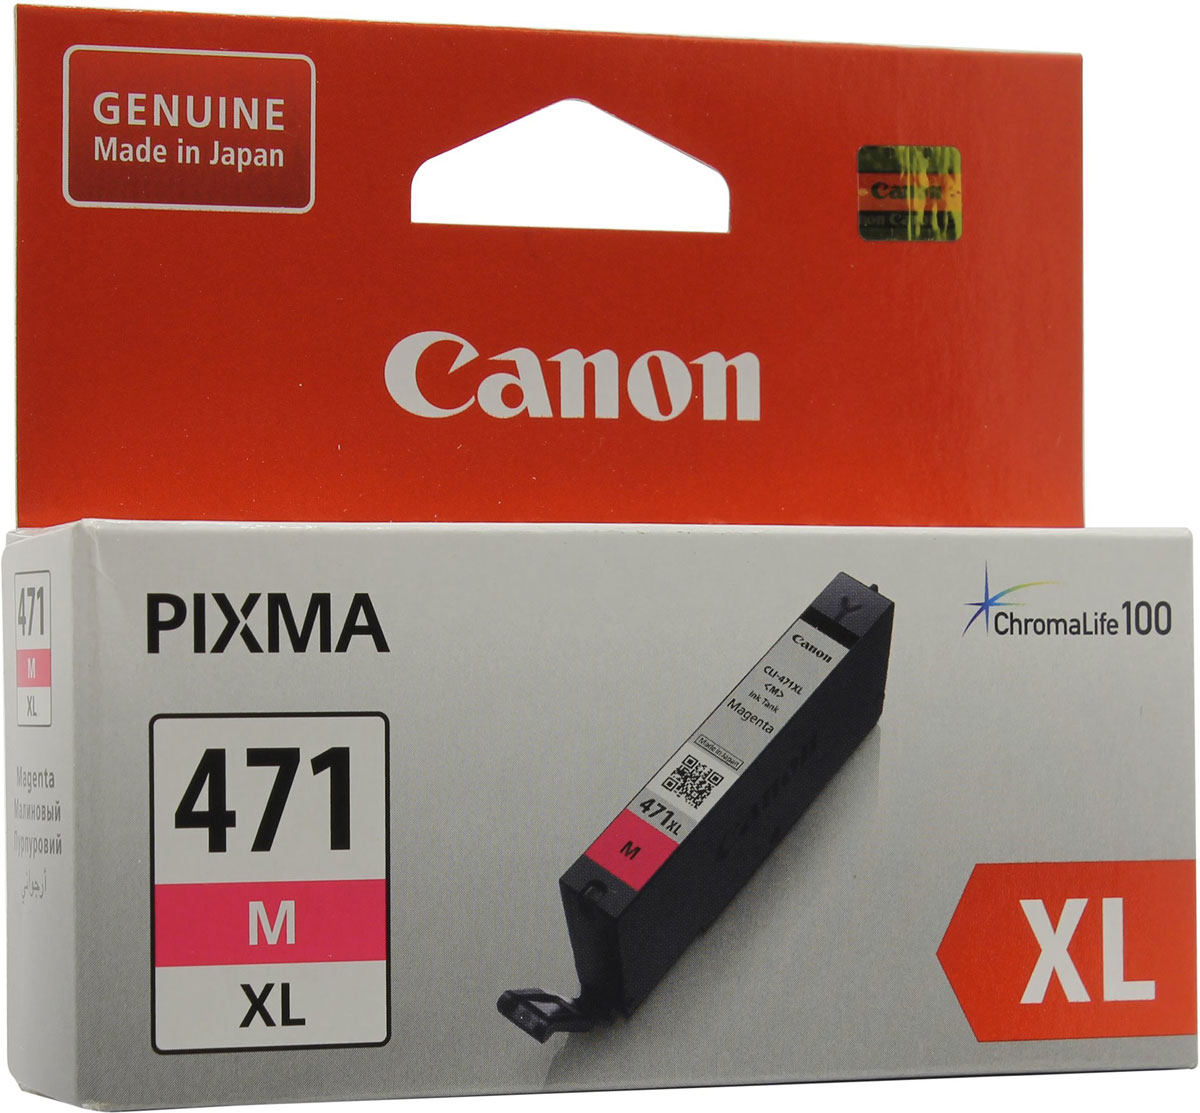 Canon CLI-471XL, Magenta картридж для Pixma MG5740/6840/7740 чернильный картридж canon cli 451gy xl grey